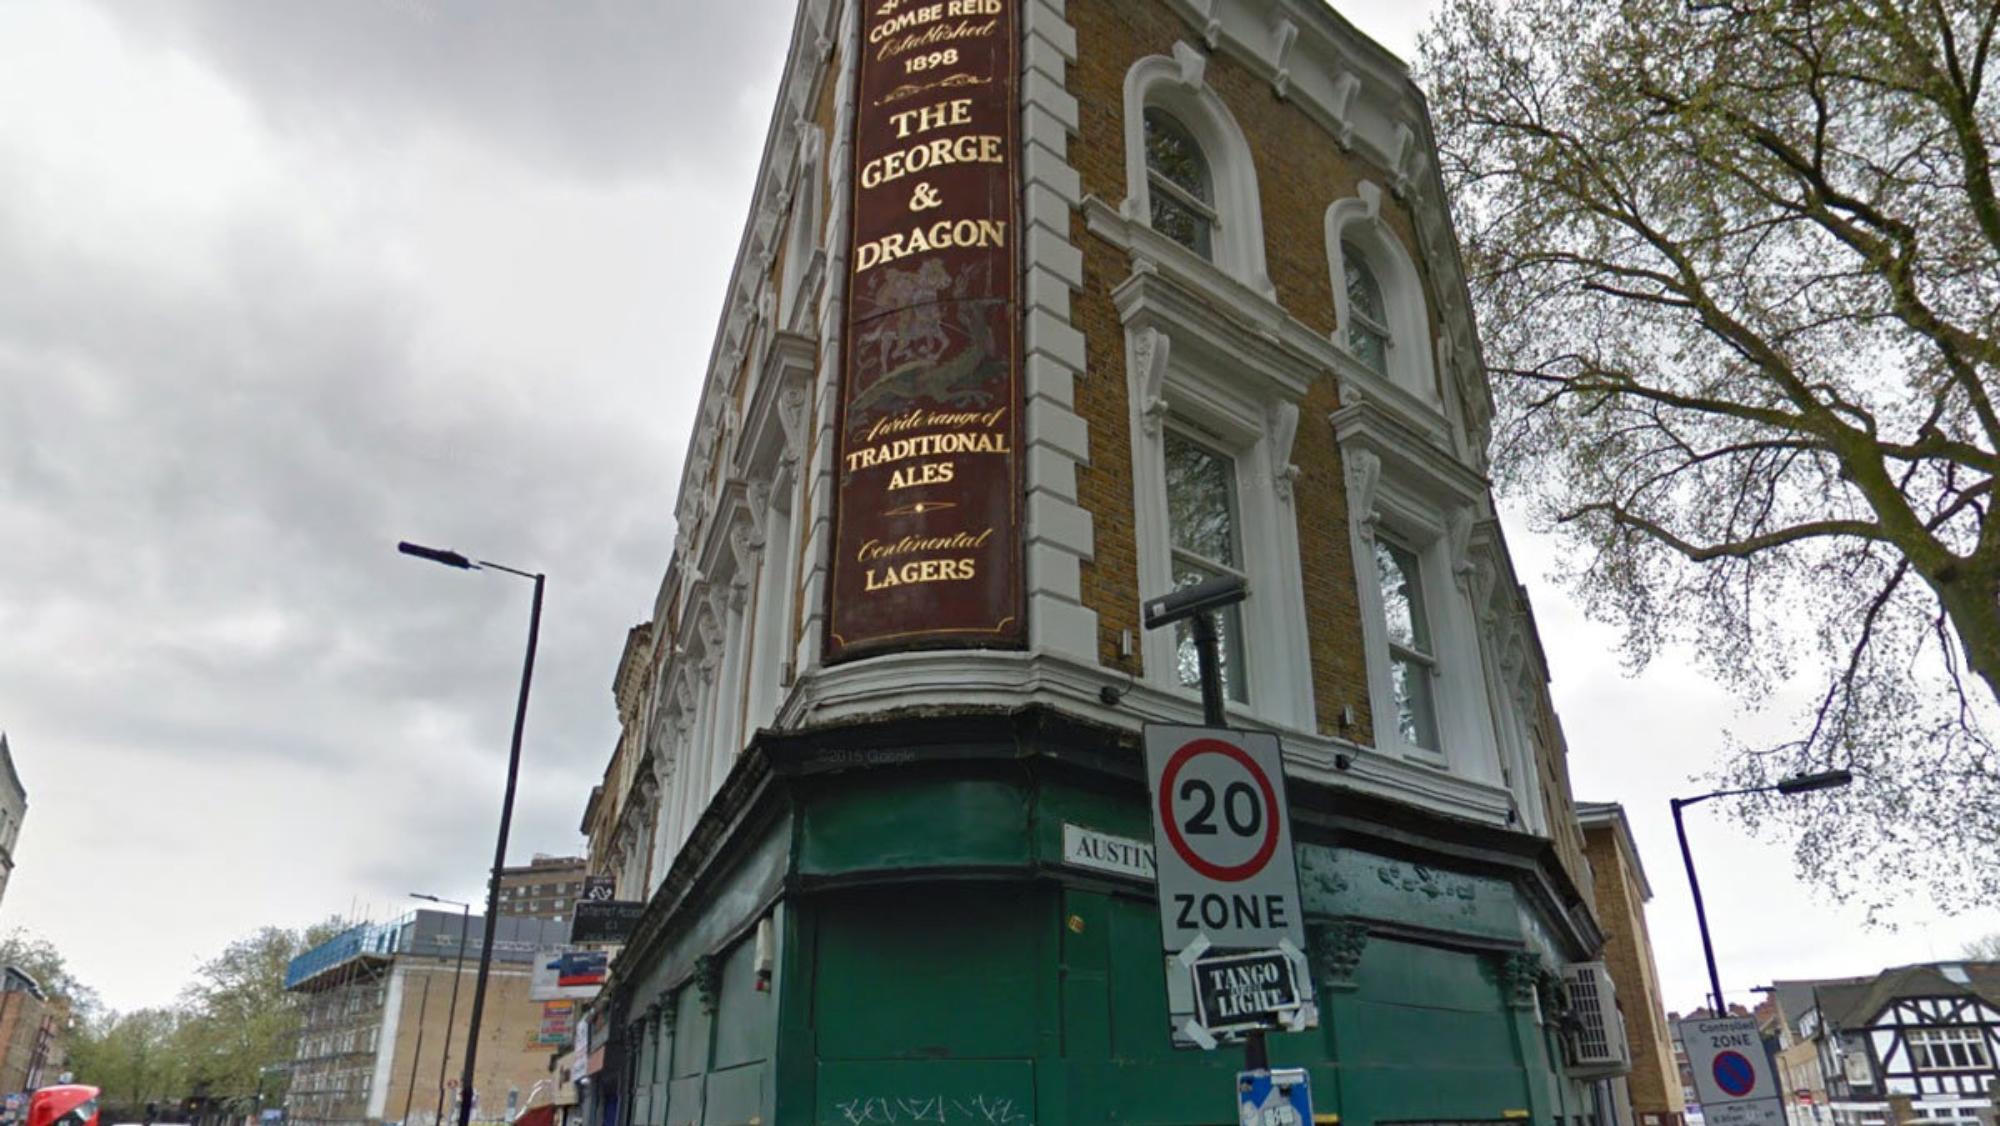 east london's legendary gay pub, the george & dragon, shuts it doors